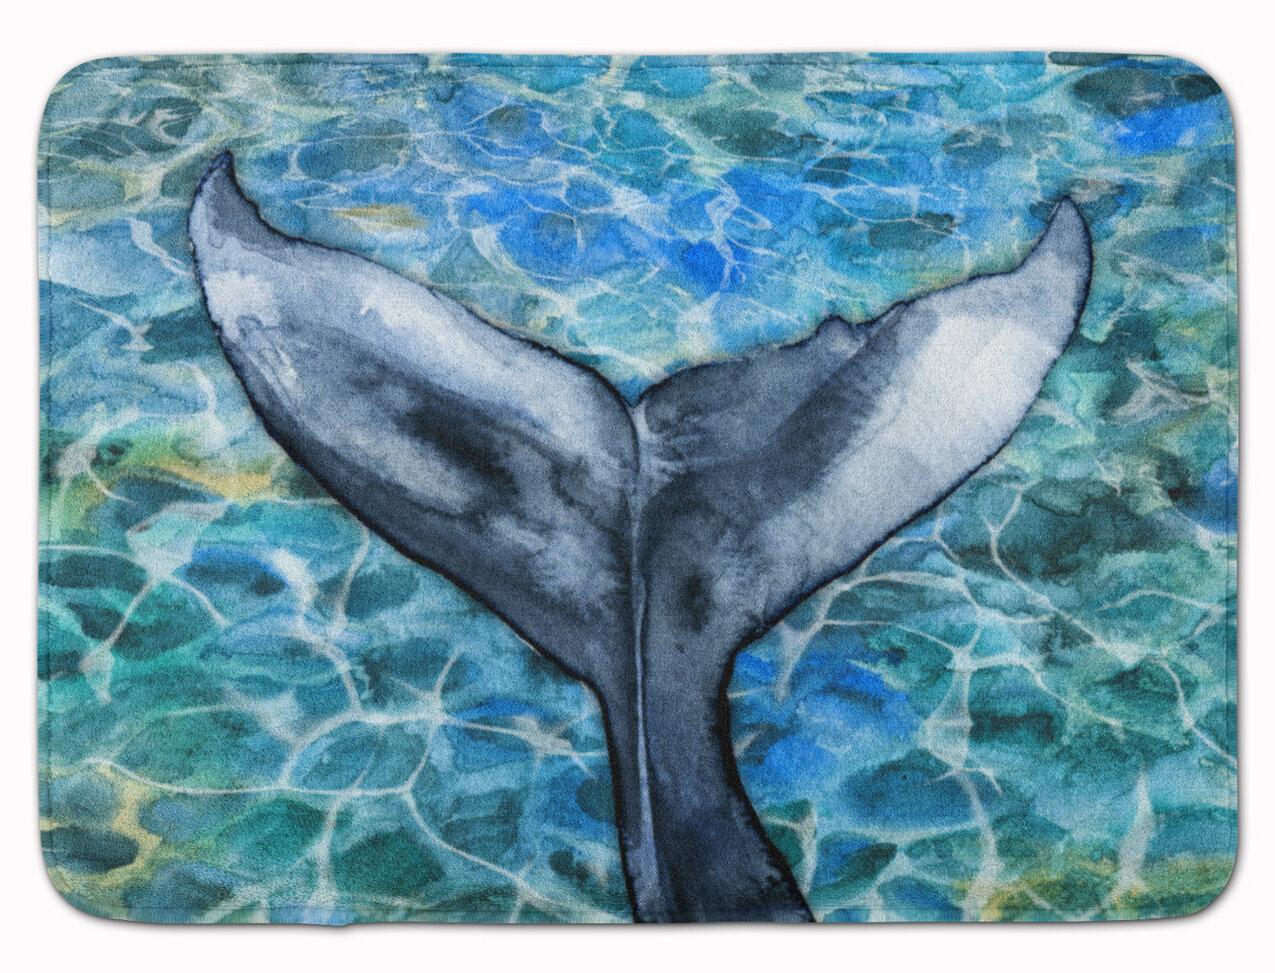 East Urban Home Hachi Whale Tail Rectangle Microfiber Non Slip Bath Rug Wayfair